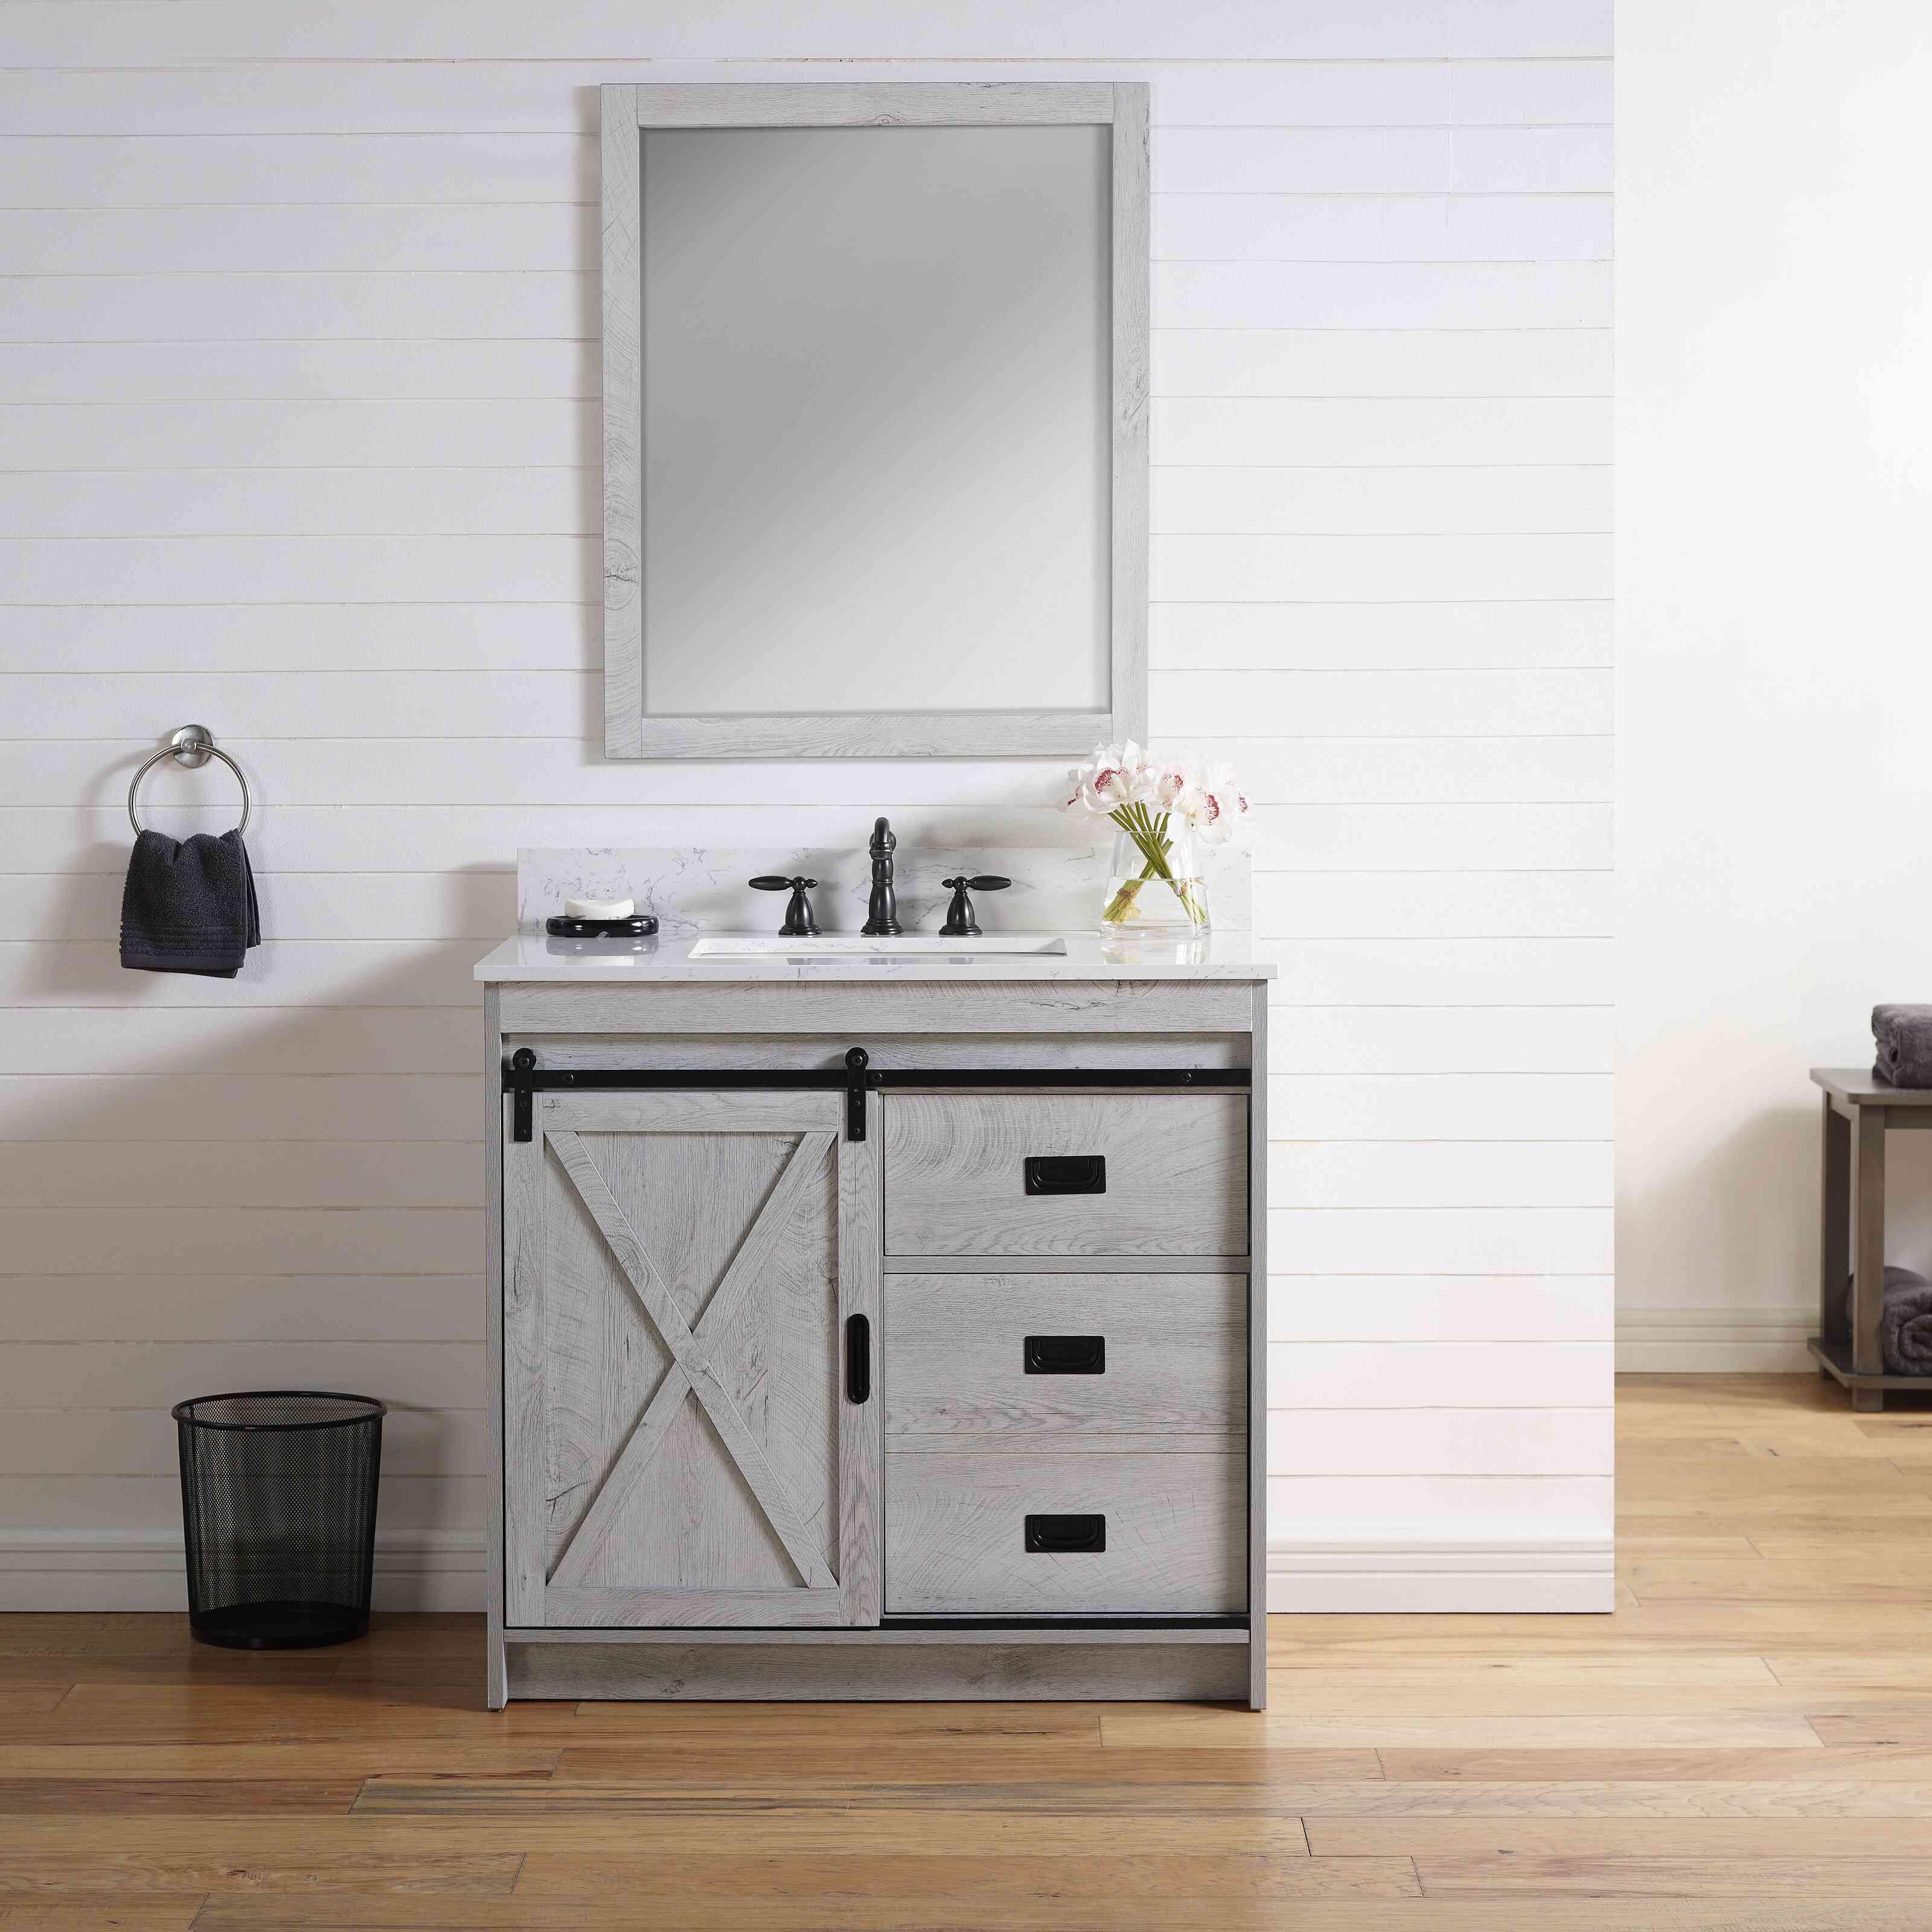 "Coastal Farmhouse Jillian 36"" Single Bathroom Vanity Set"